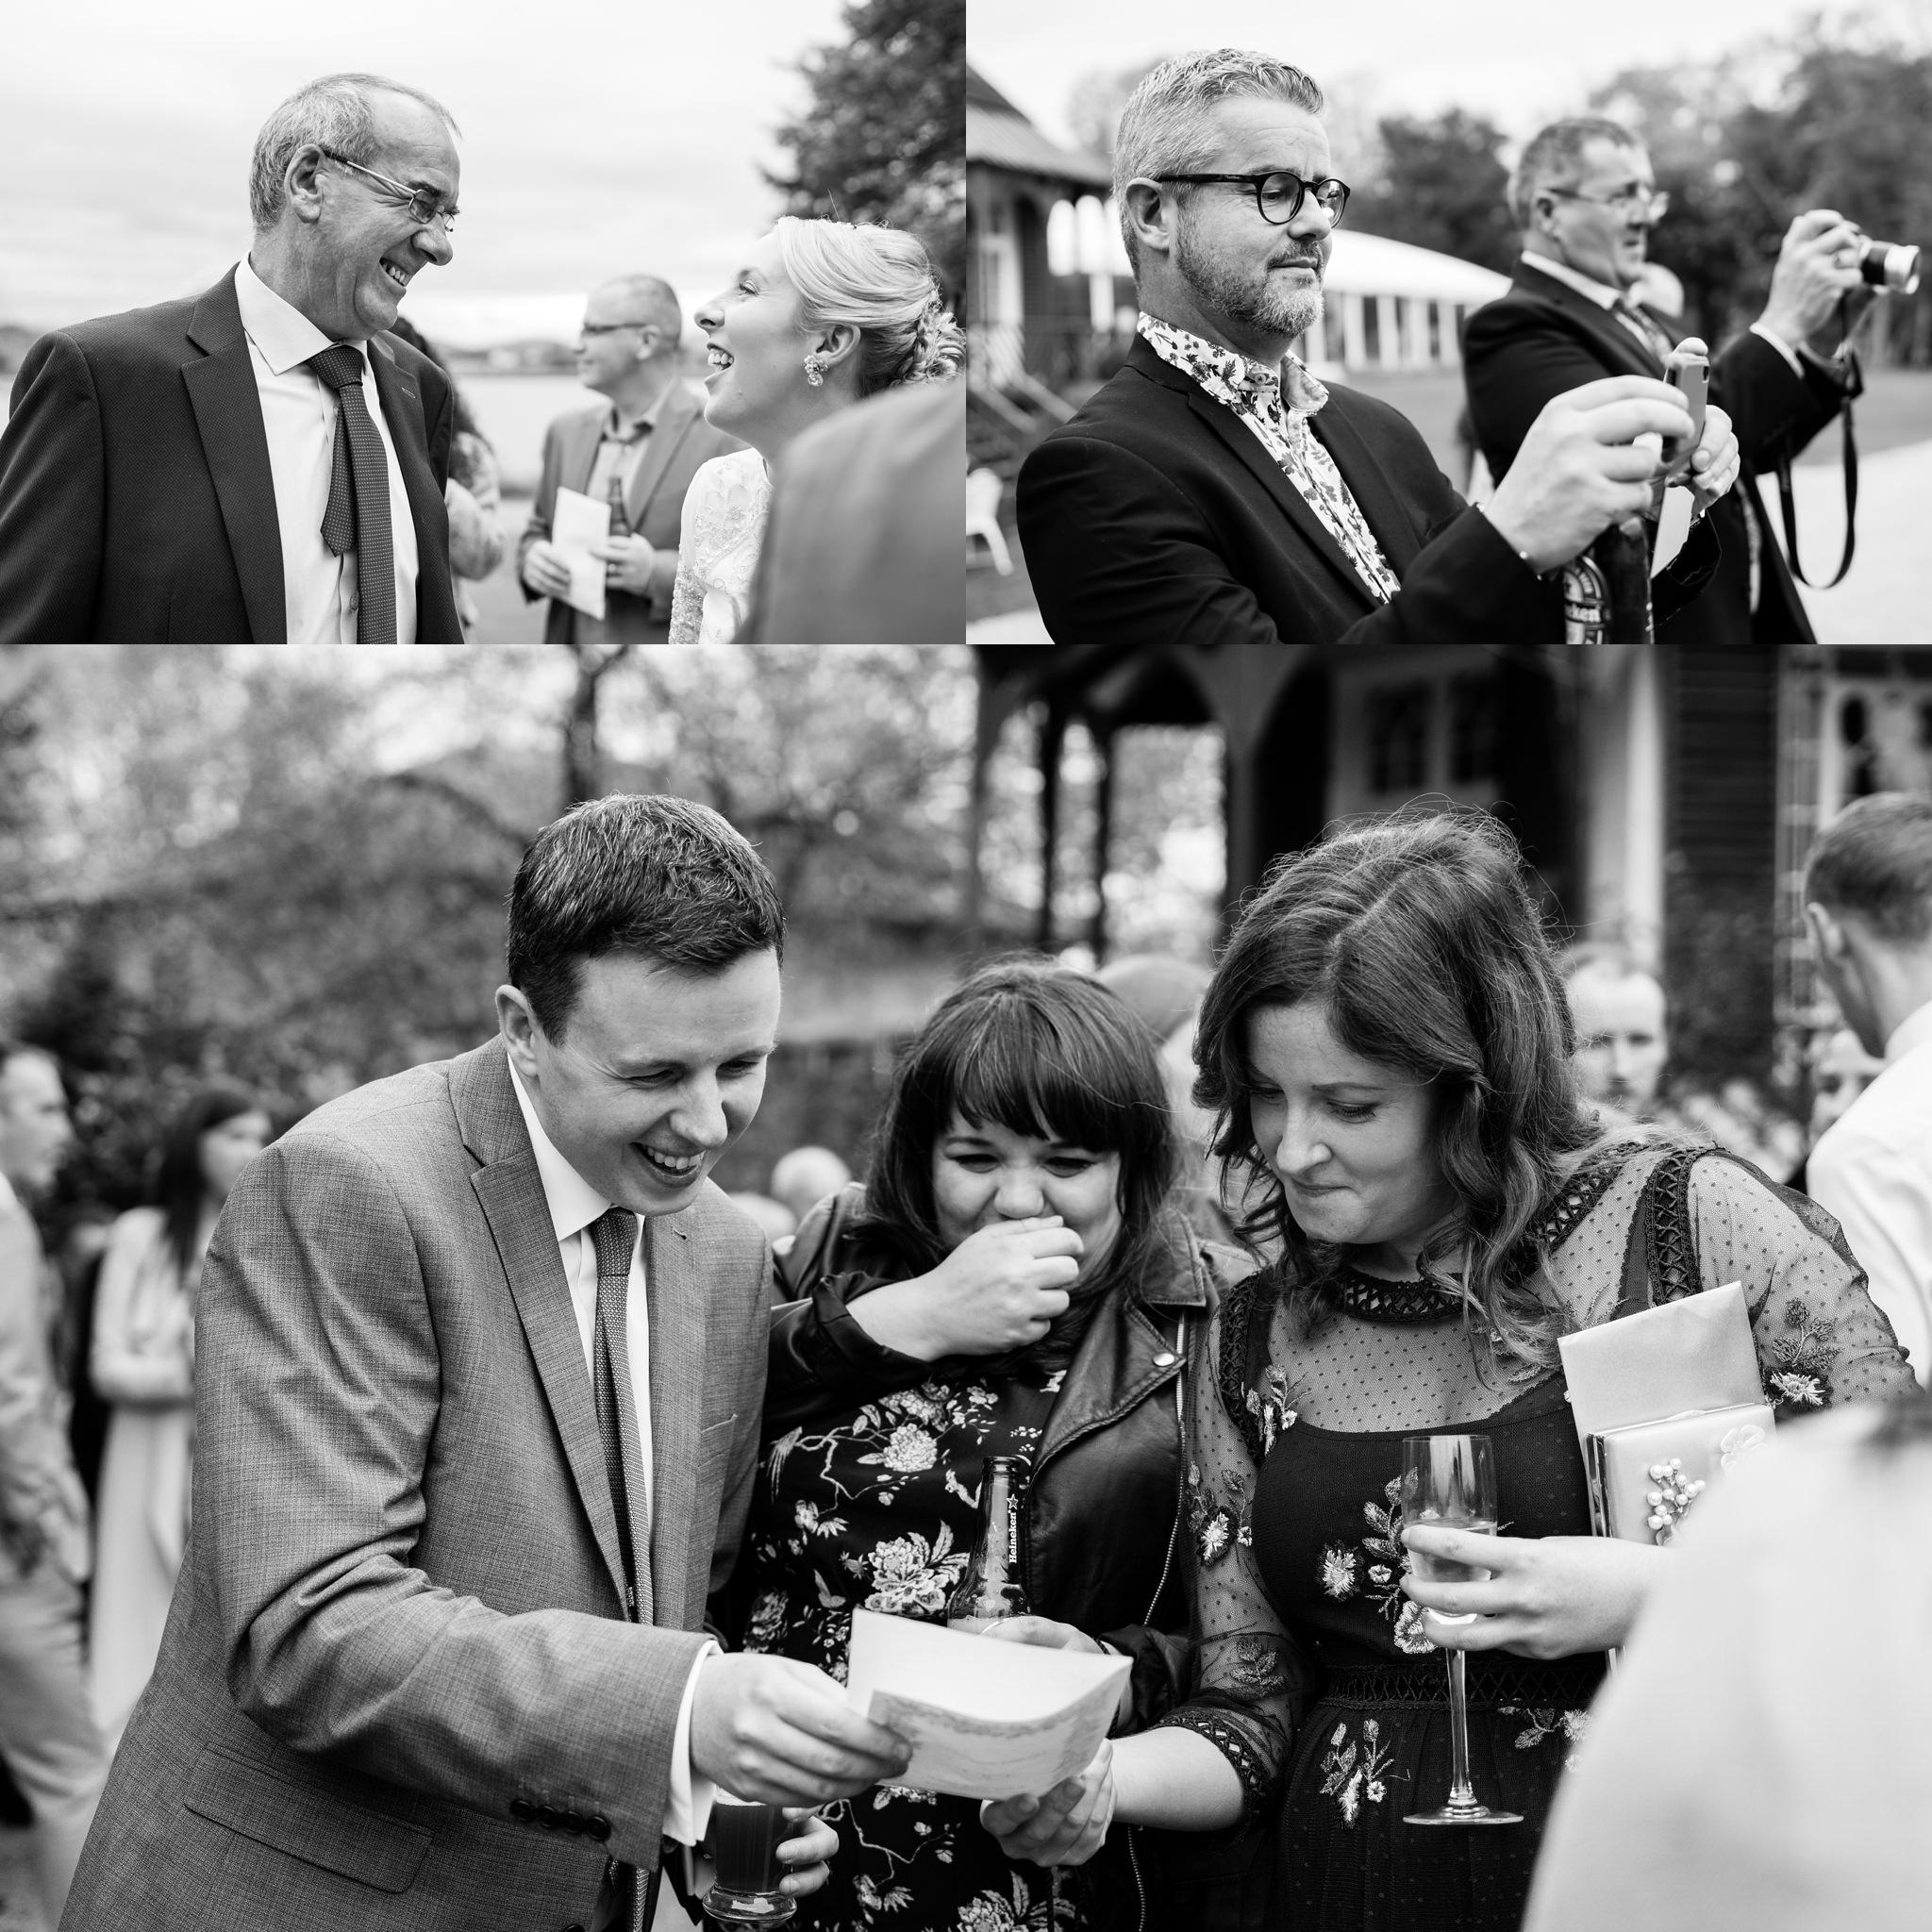 Elisha-Clarke-Photography-Dublin-City-Wedding_0081.jpg